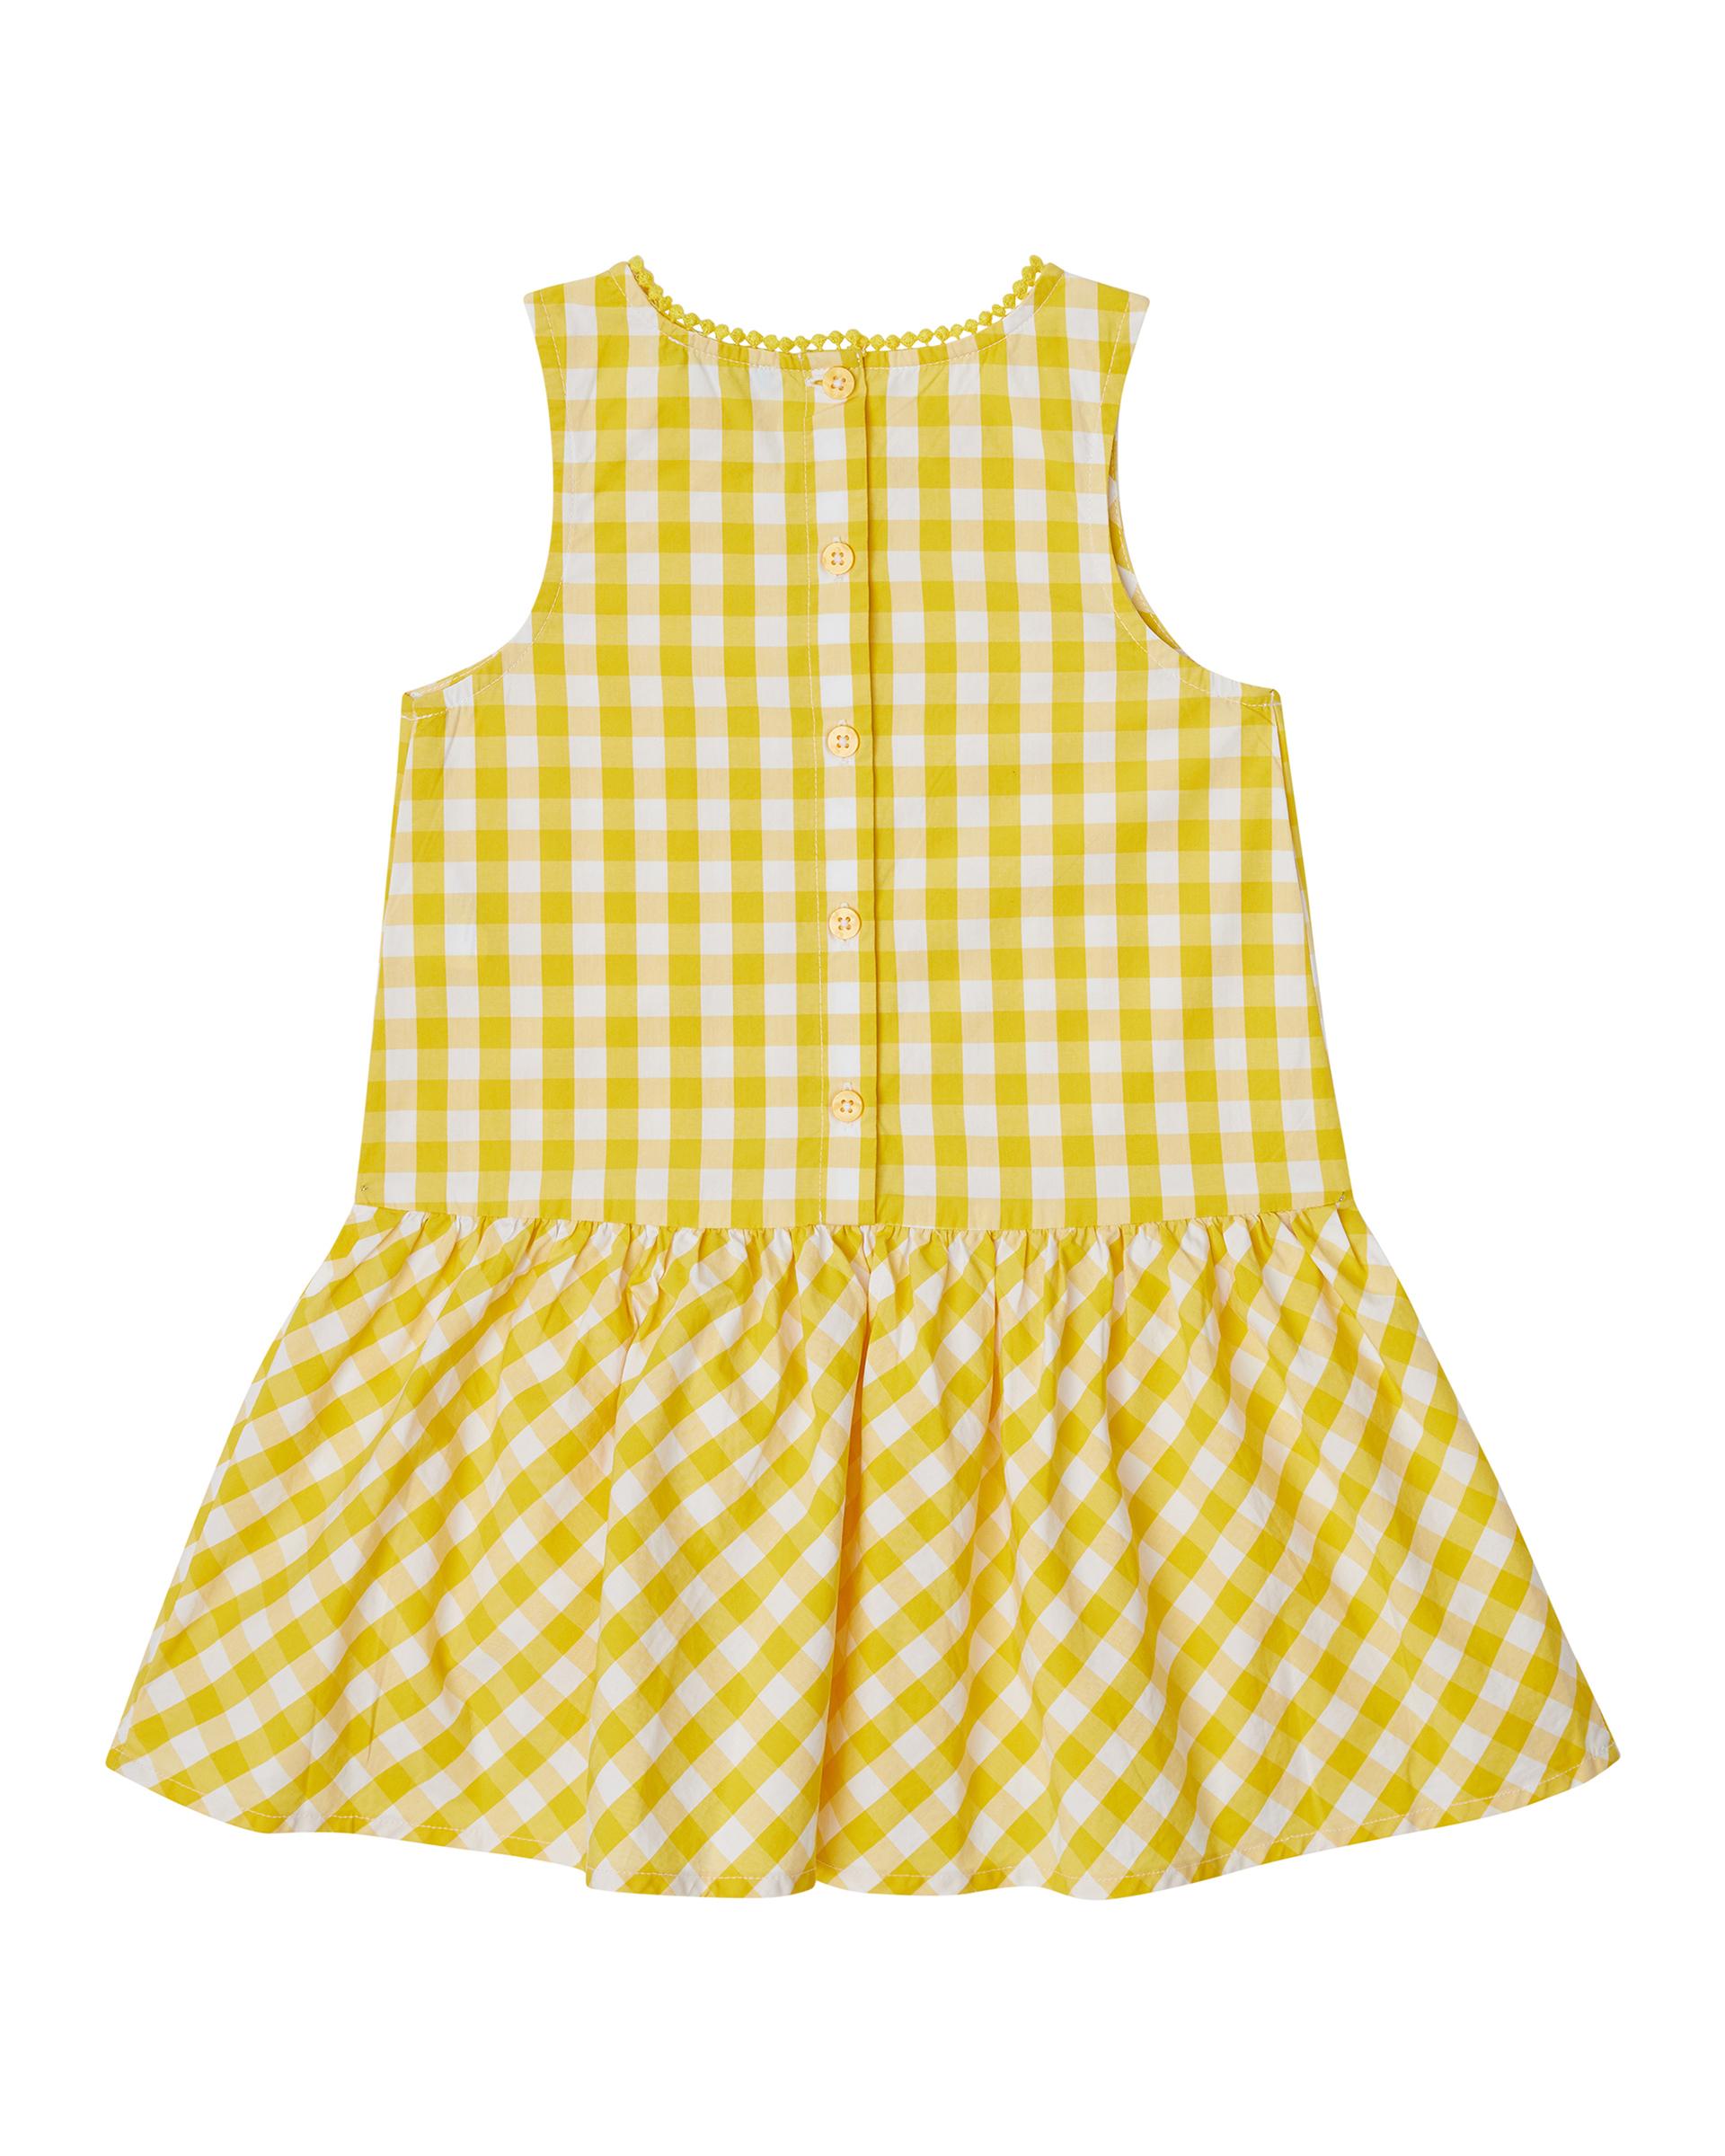 20P_4OT75V2LP_930, Платье для девочек Benetton 4OT75V2LP_930 р-р 104, United Colors of Benetton, Платья для девочек  - купить со скидкой